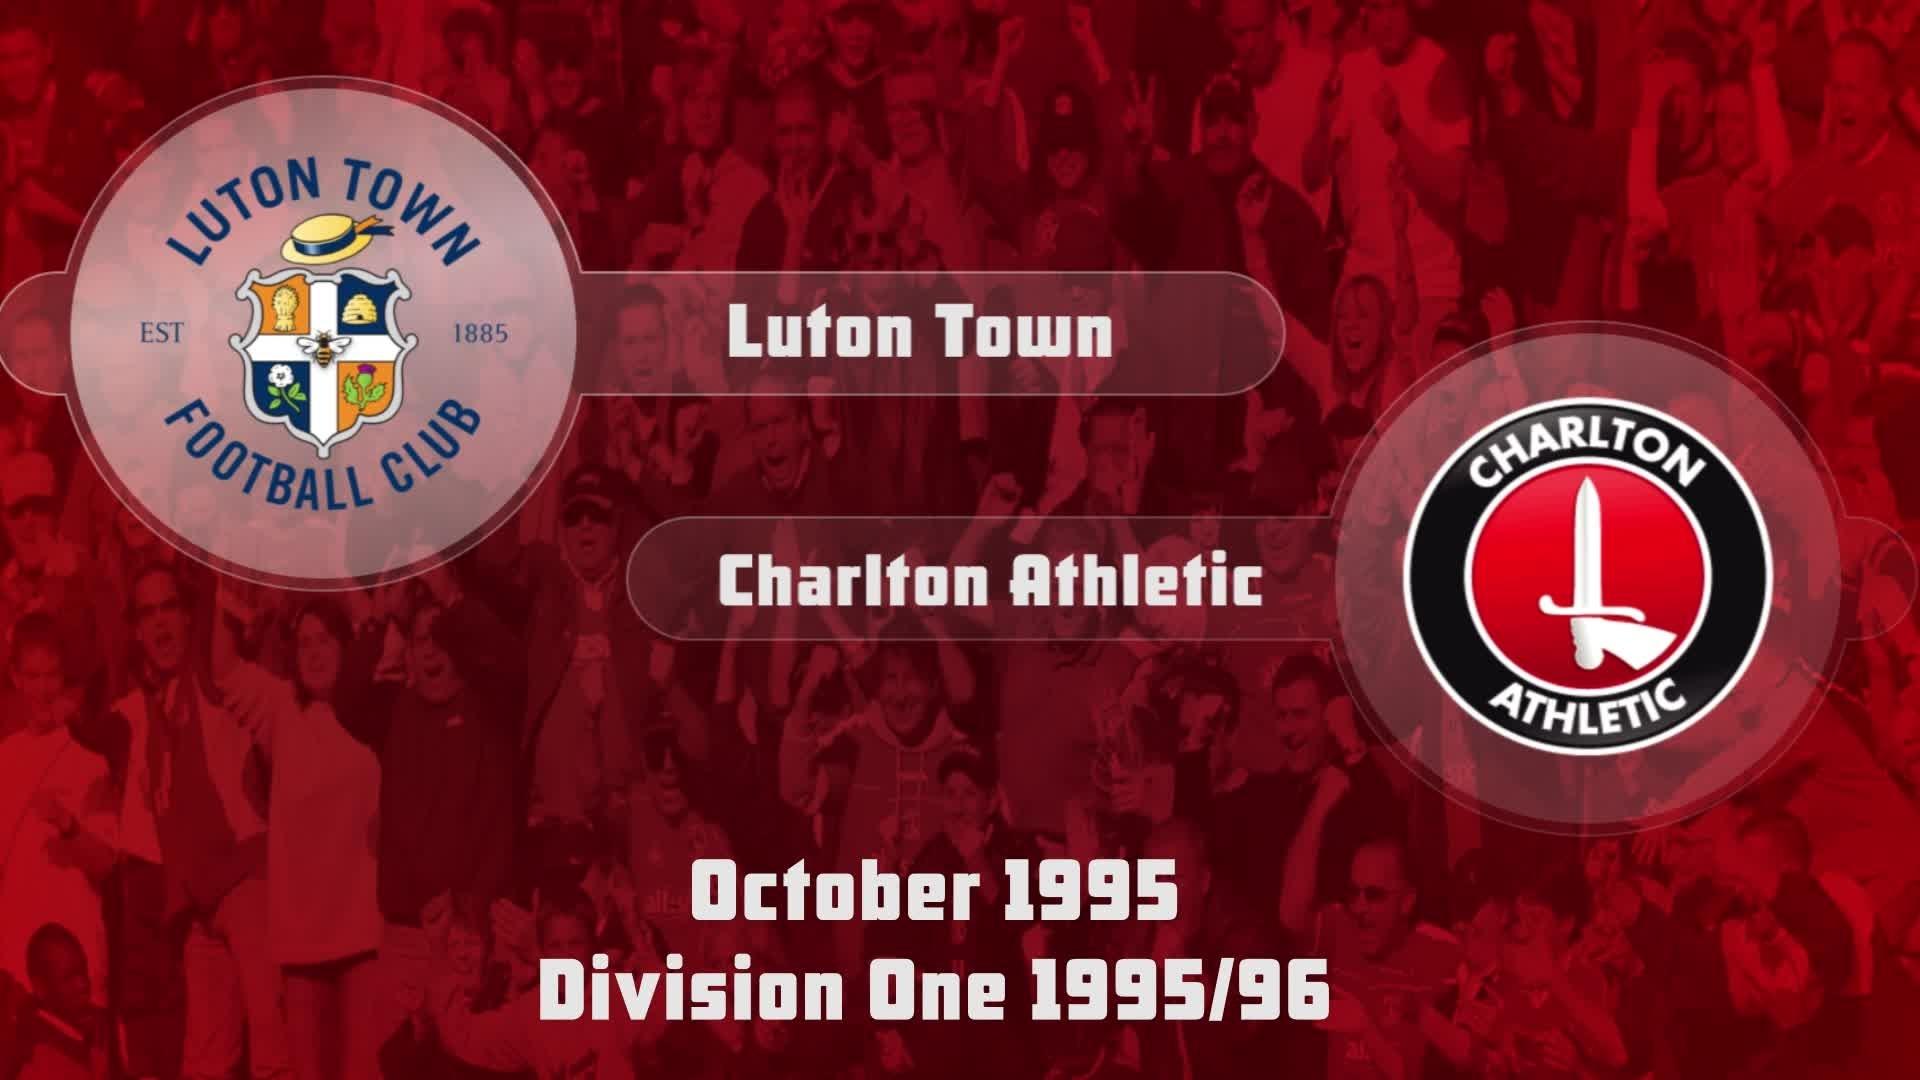 19 HIGHLIGHTS | Luton 0 Charlton 1 (Oct 1995)